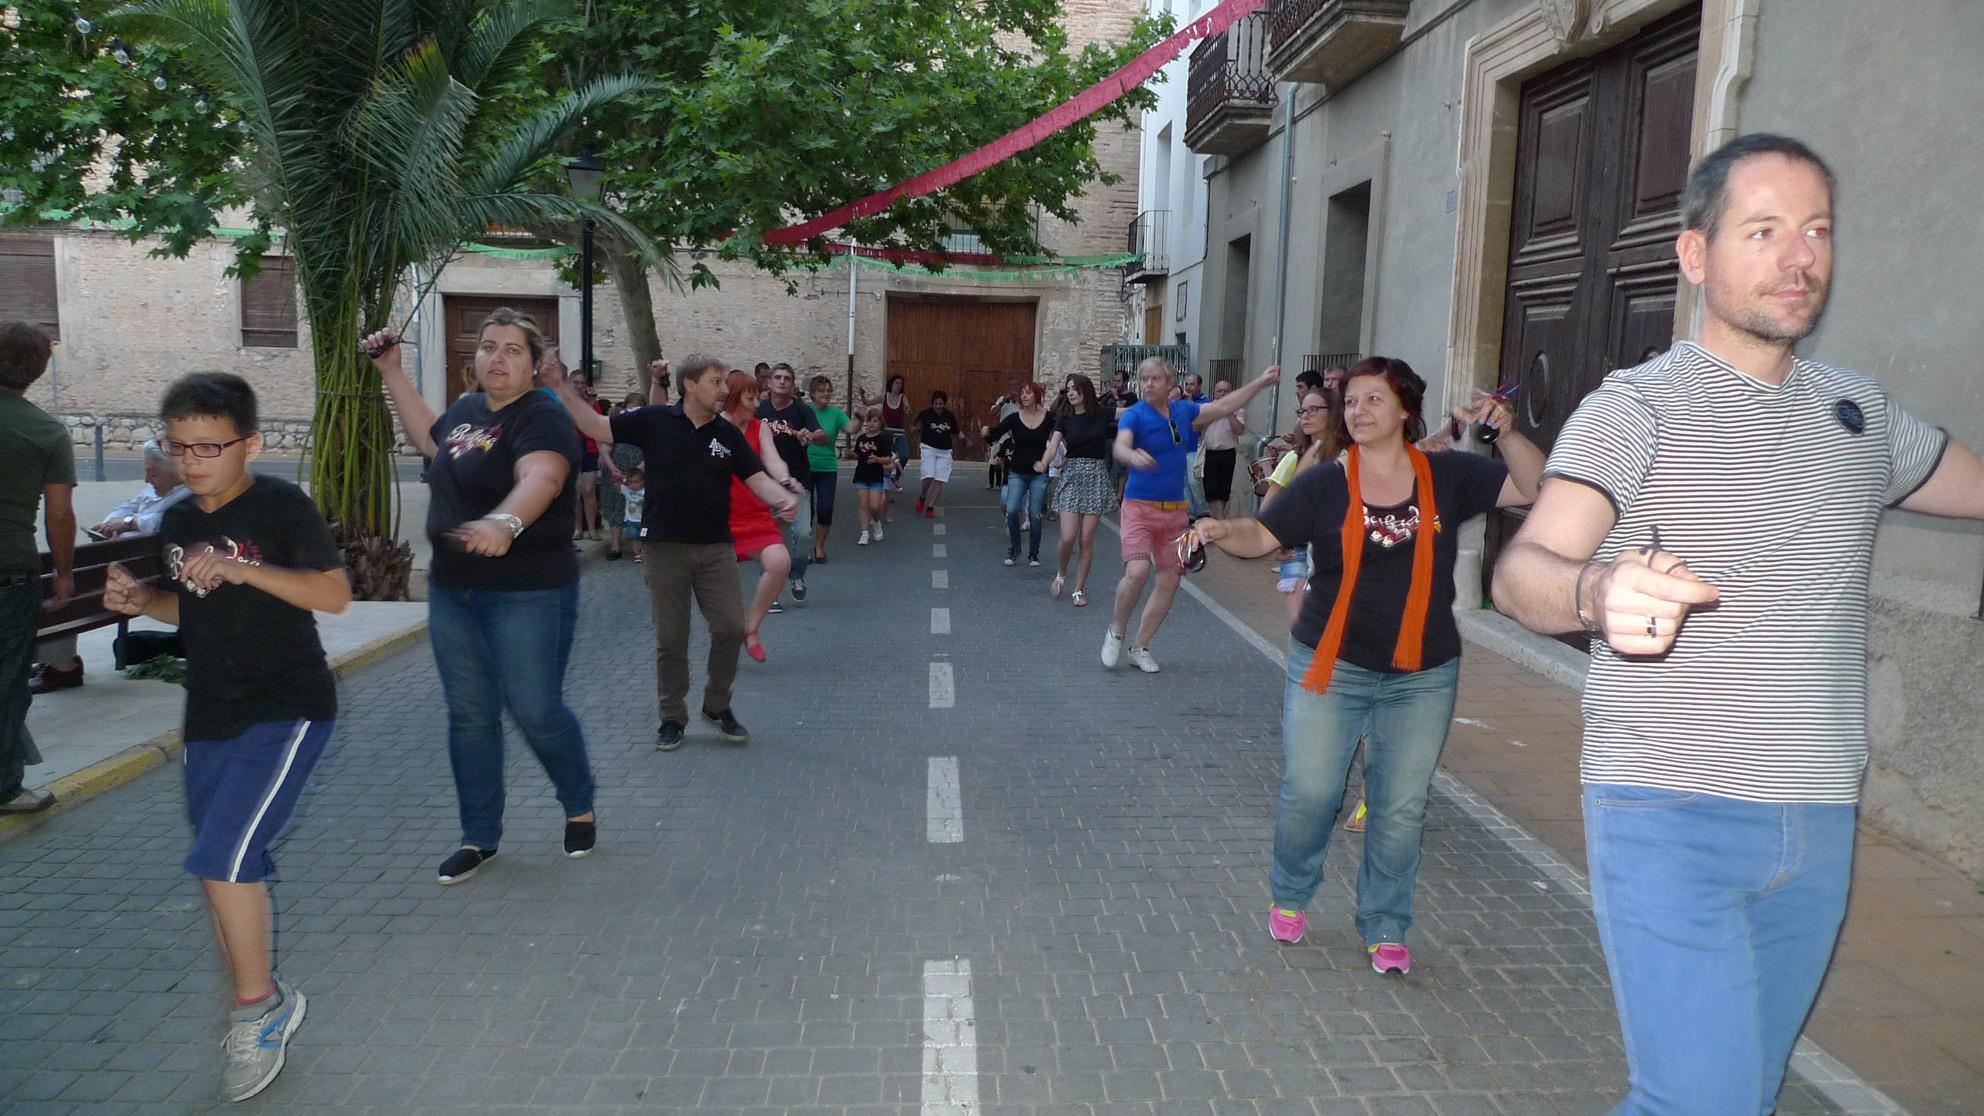 2014-07-20 PalacioDansetesPalacio i Albaes (6)